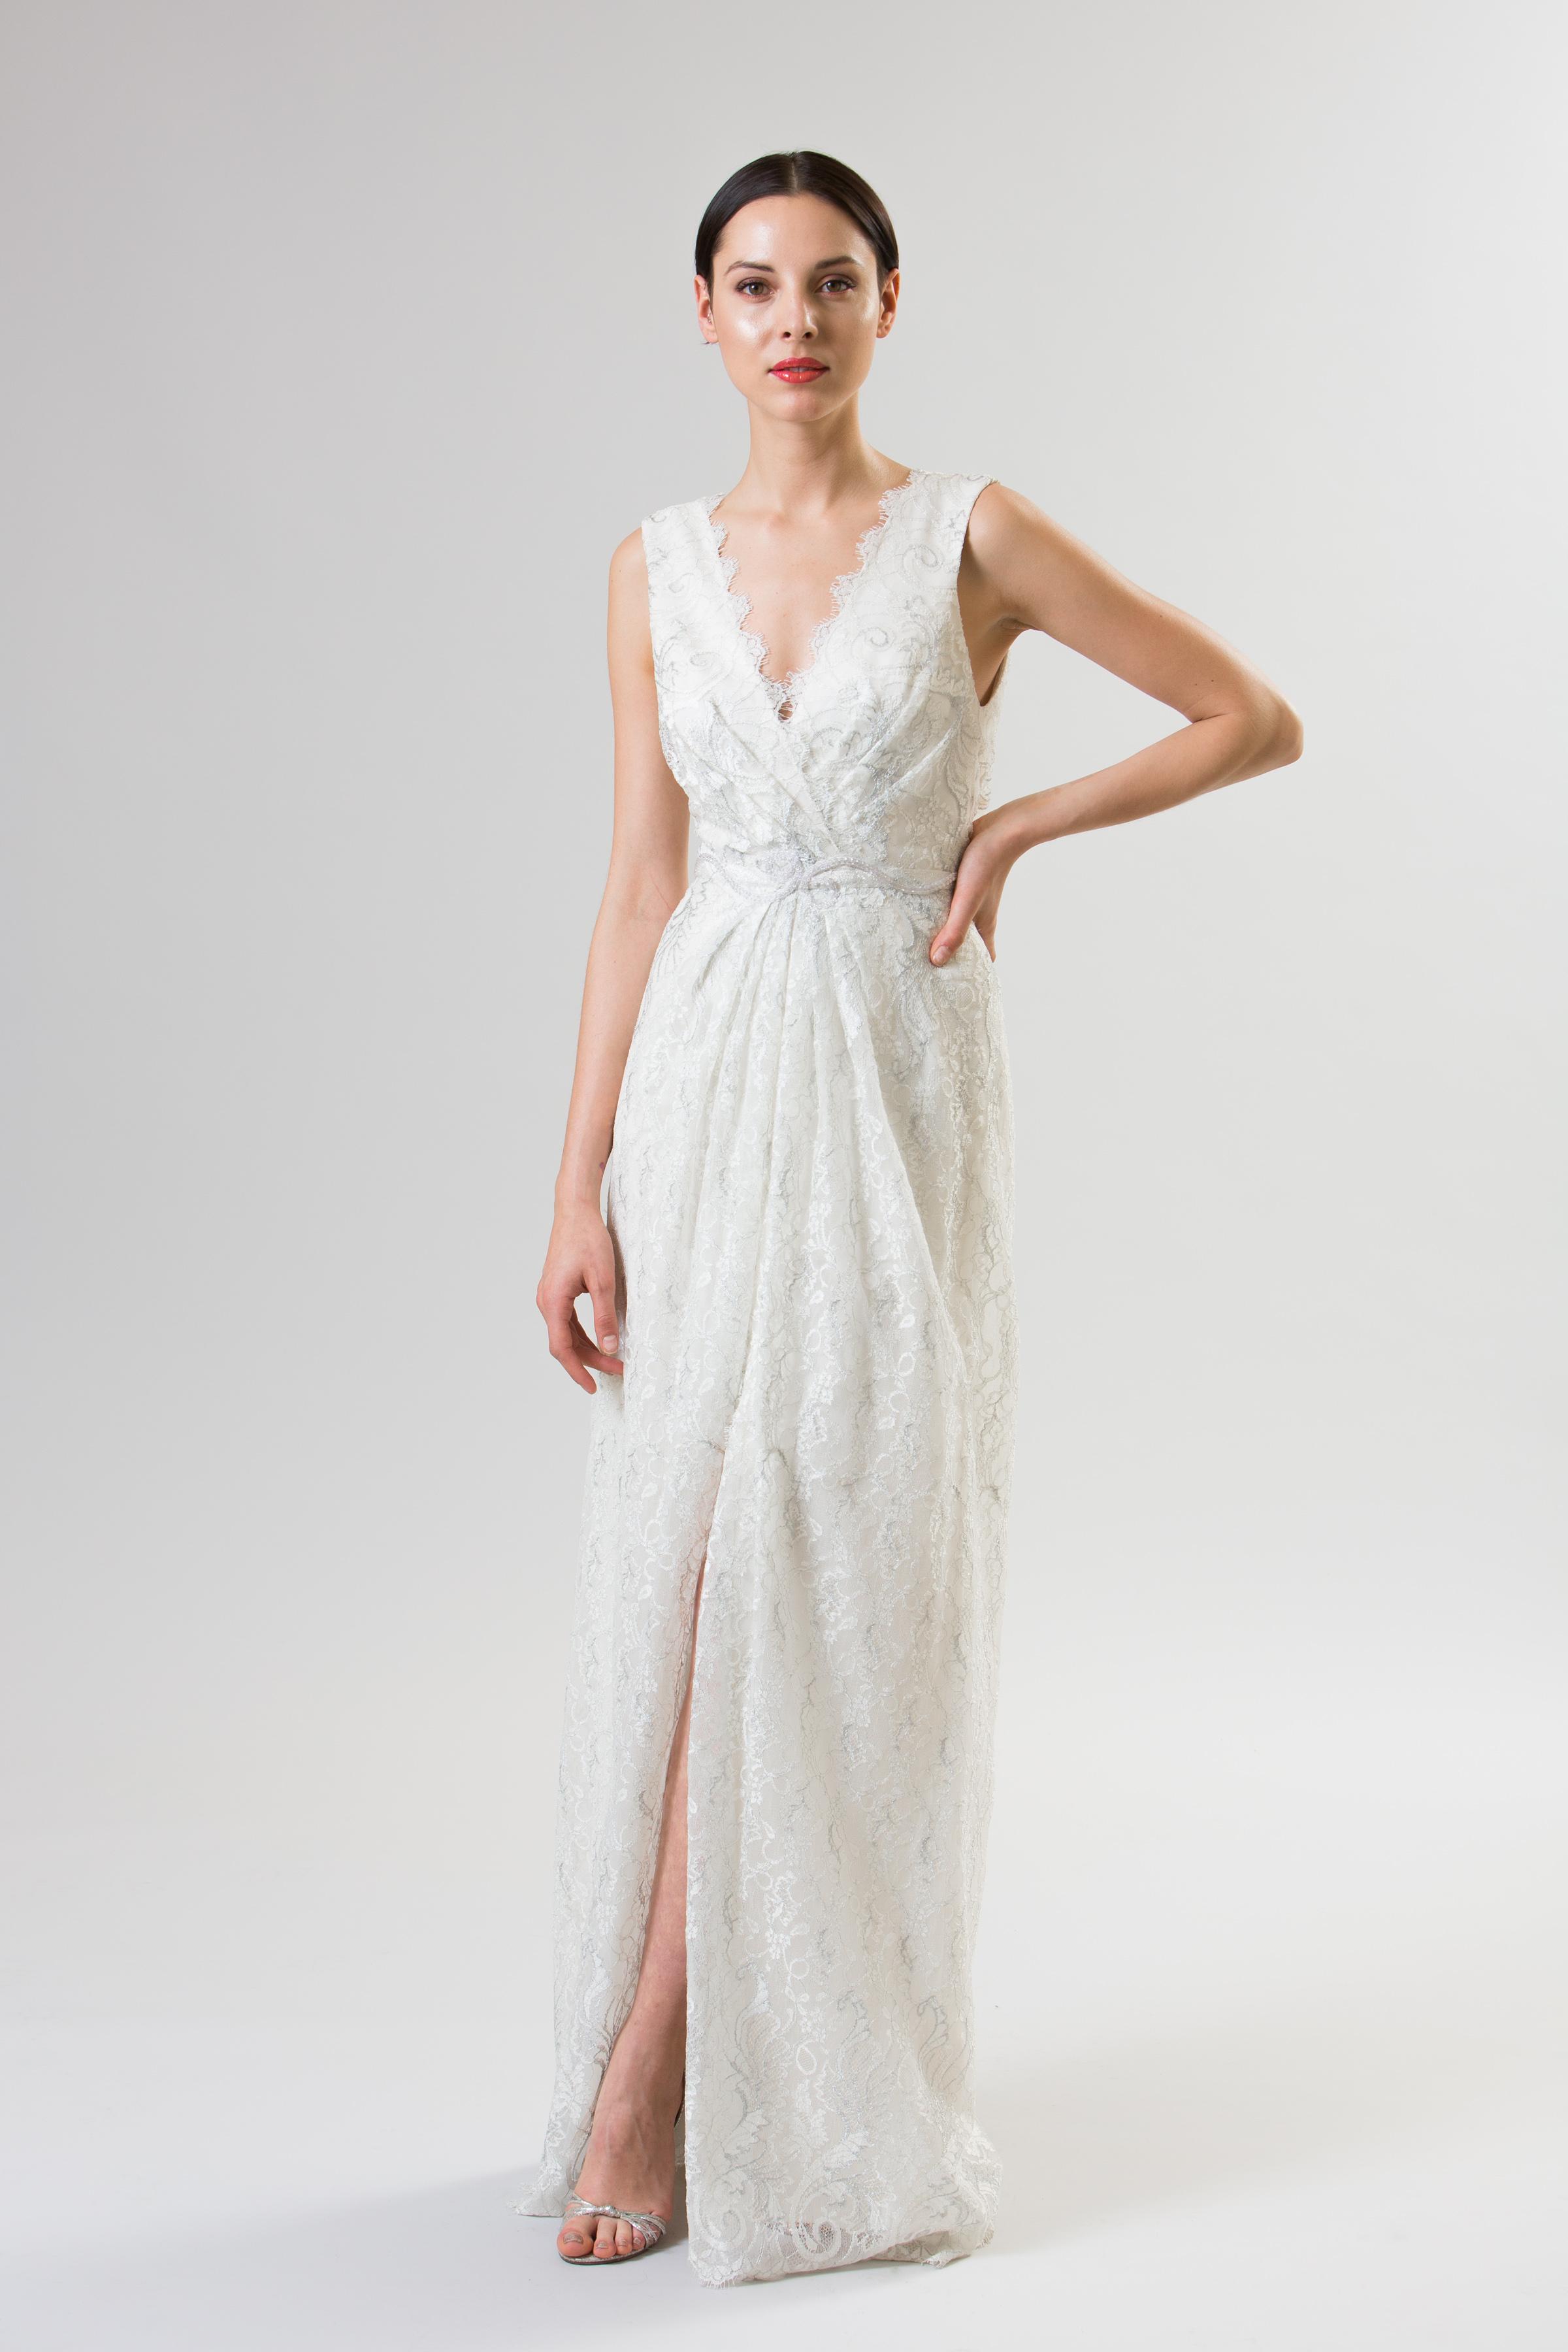 junko yoshioka summer spring 2014 wedding dress frambois 1